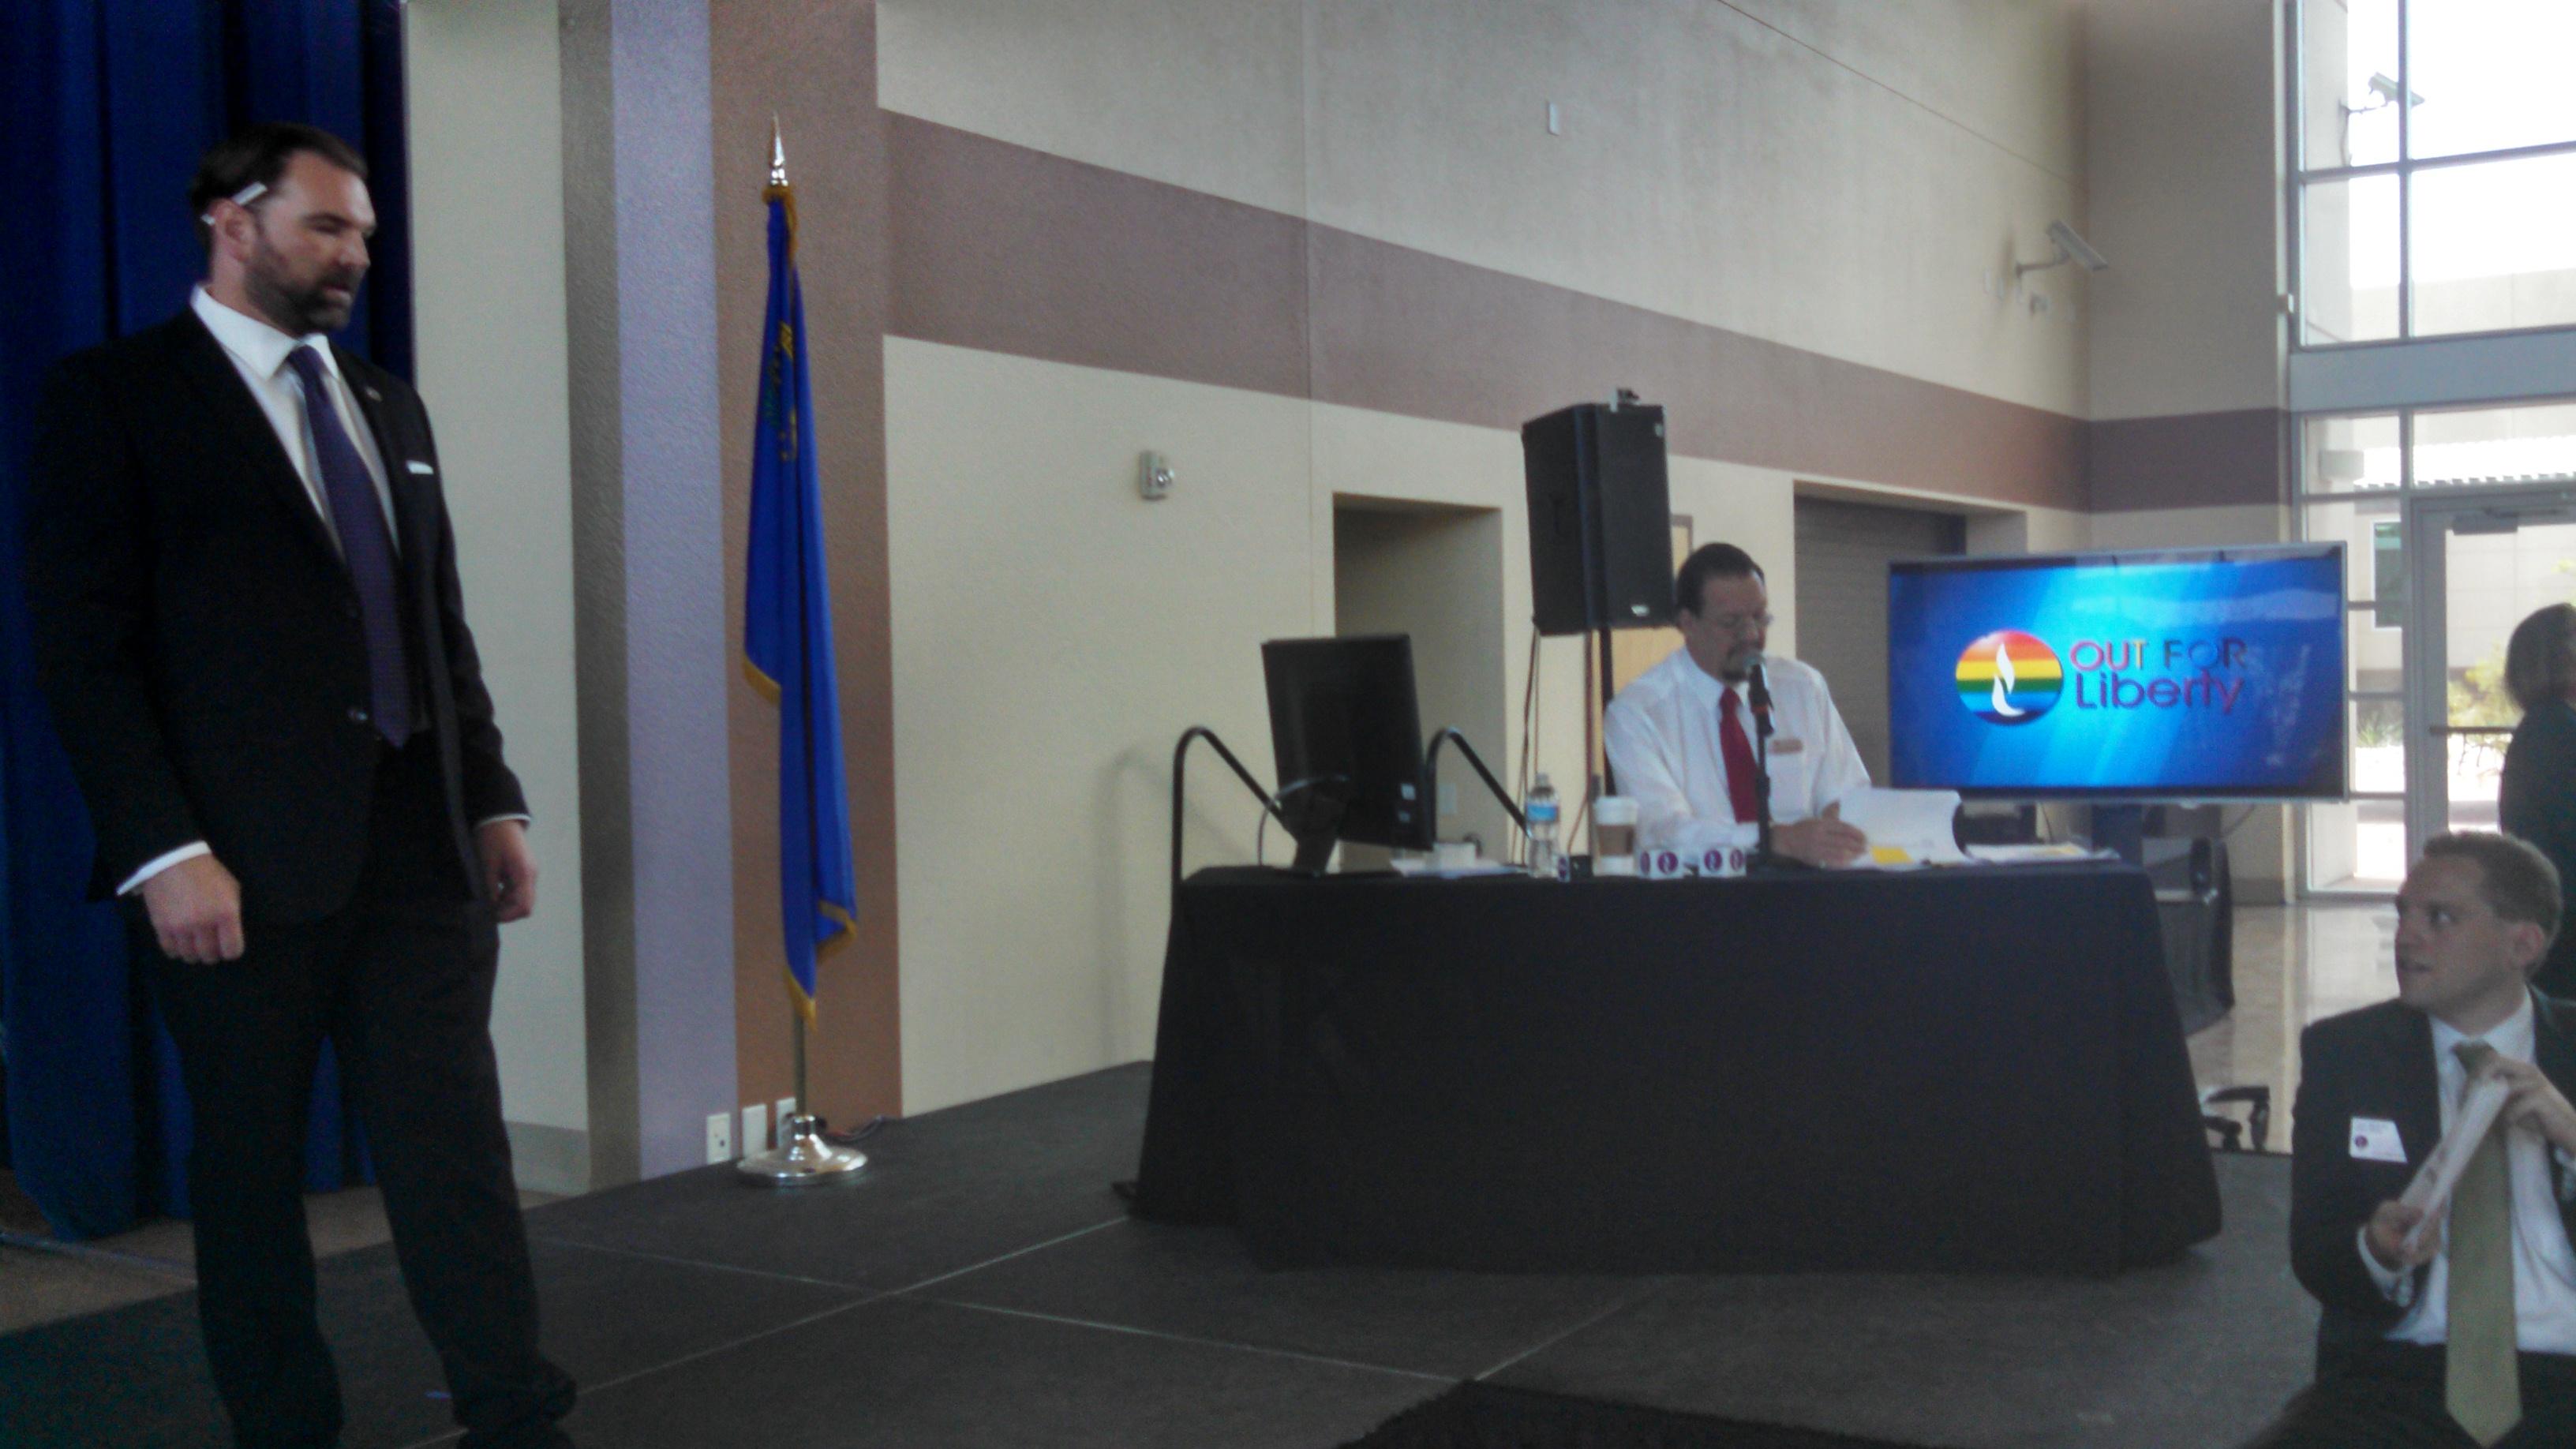 LP Nevada chair Brett H. Pojunis talks logistics with Jason Weinman as Penn prepares to moderate the debate. Photo by Zach Foster.